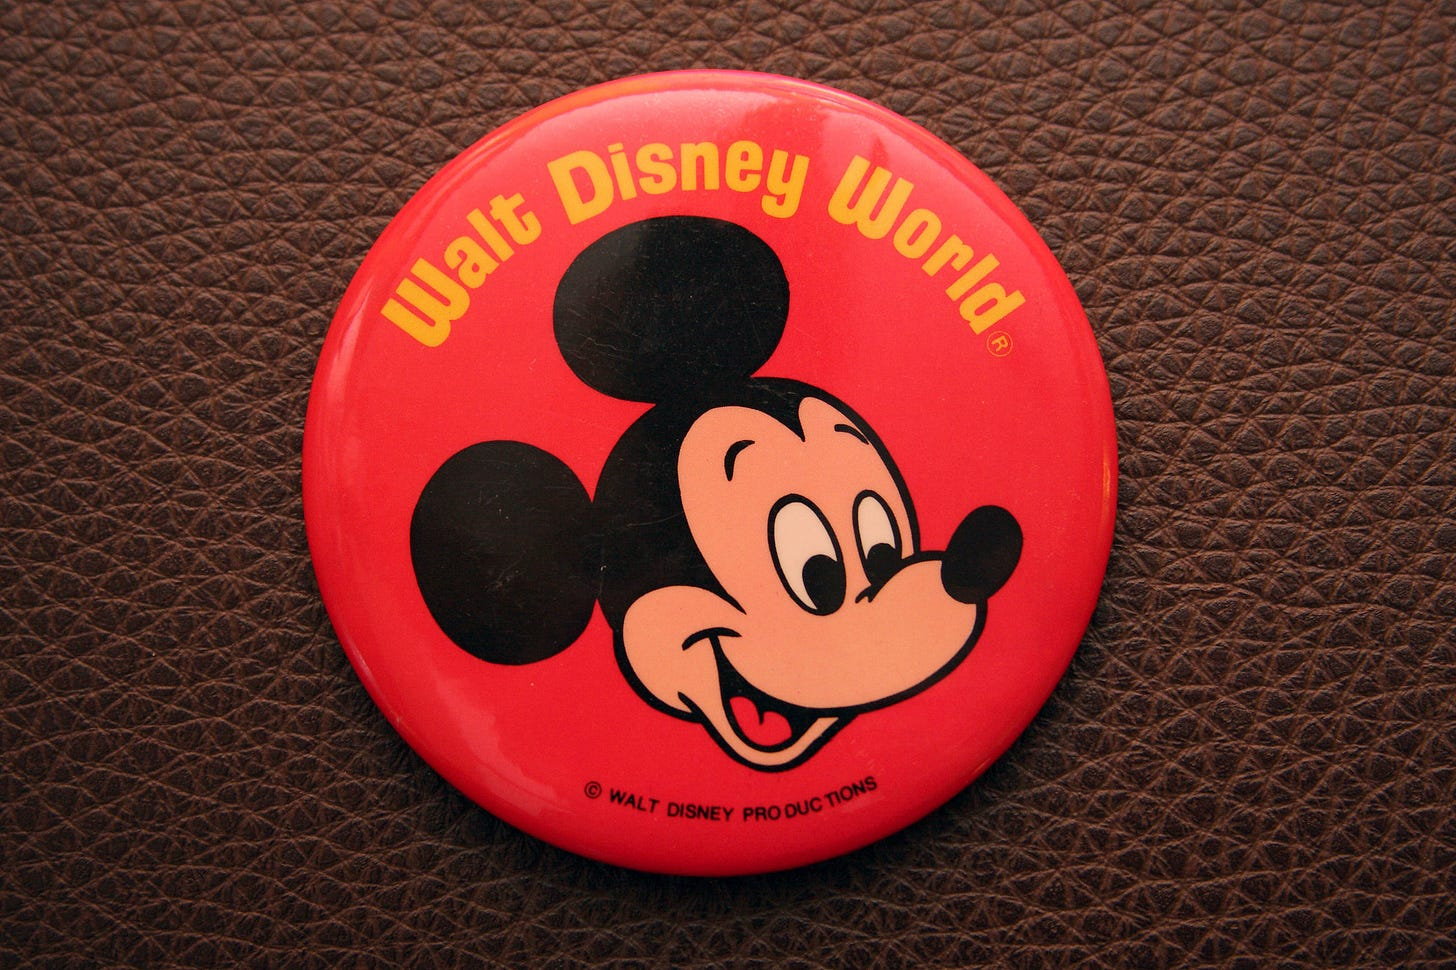 Walt Disney World button